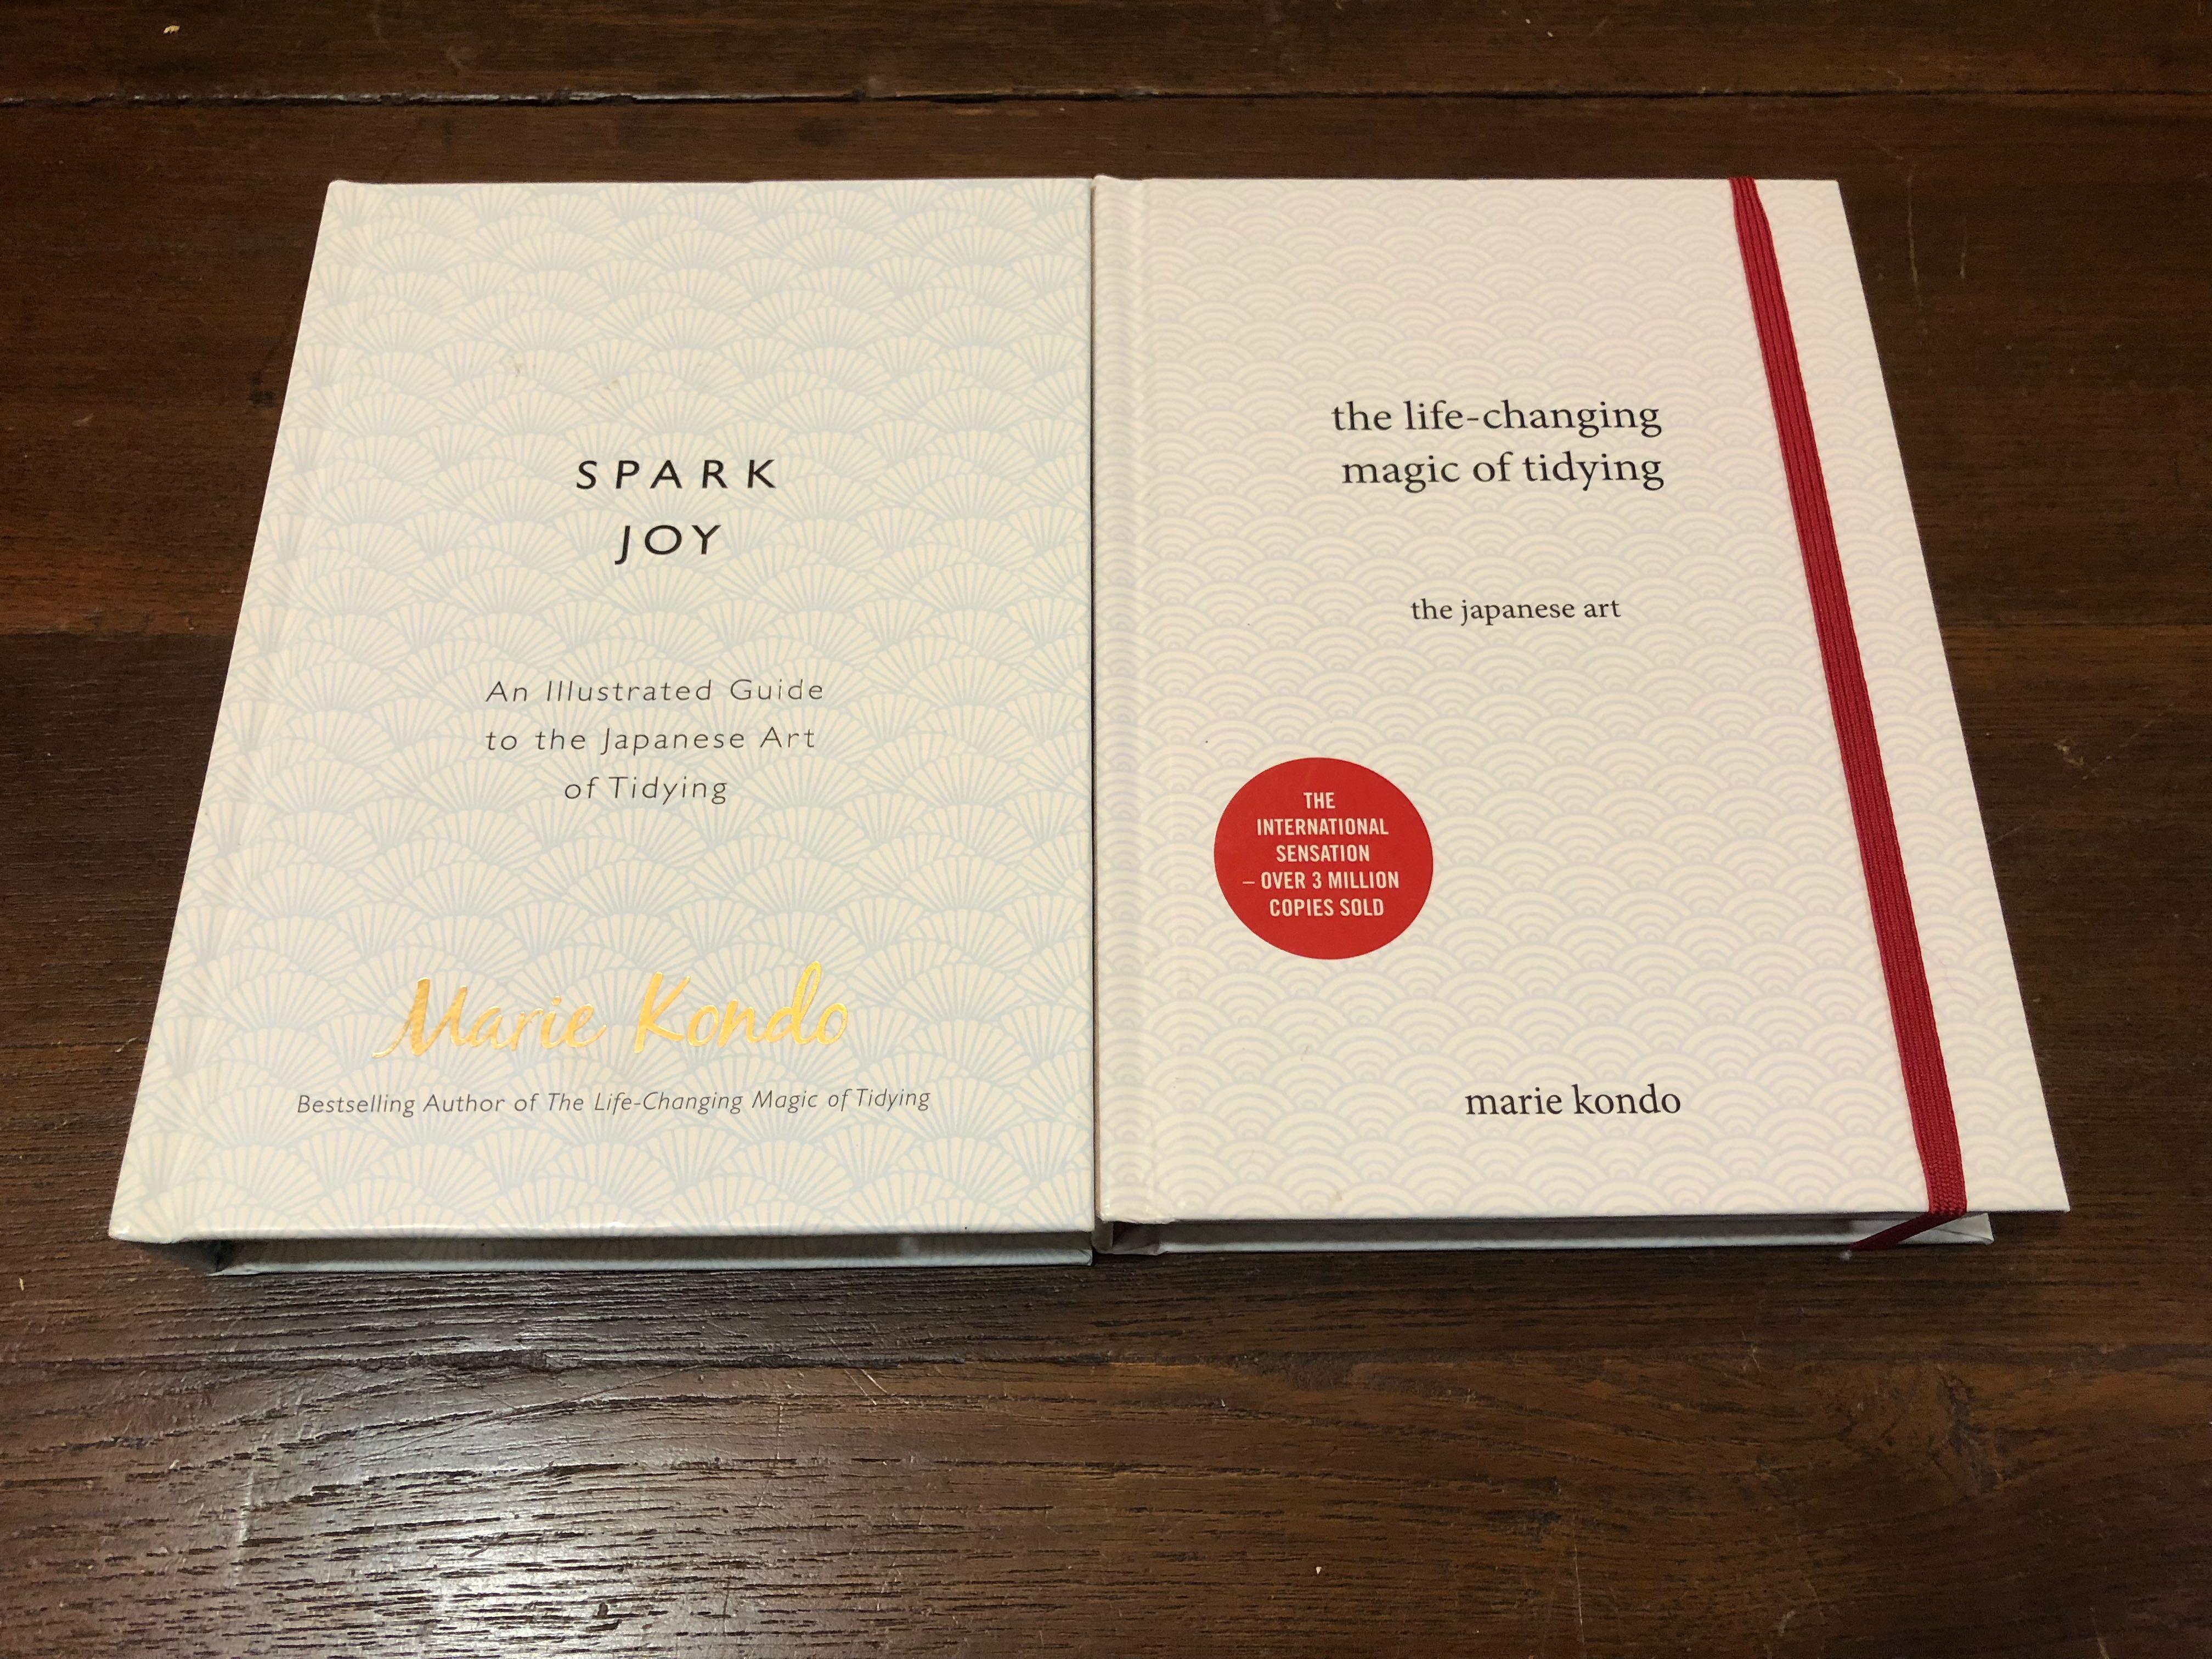 Life changing magic of tidying & Spark joy